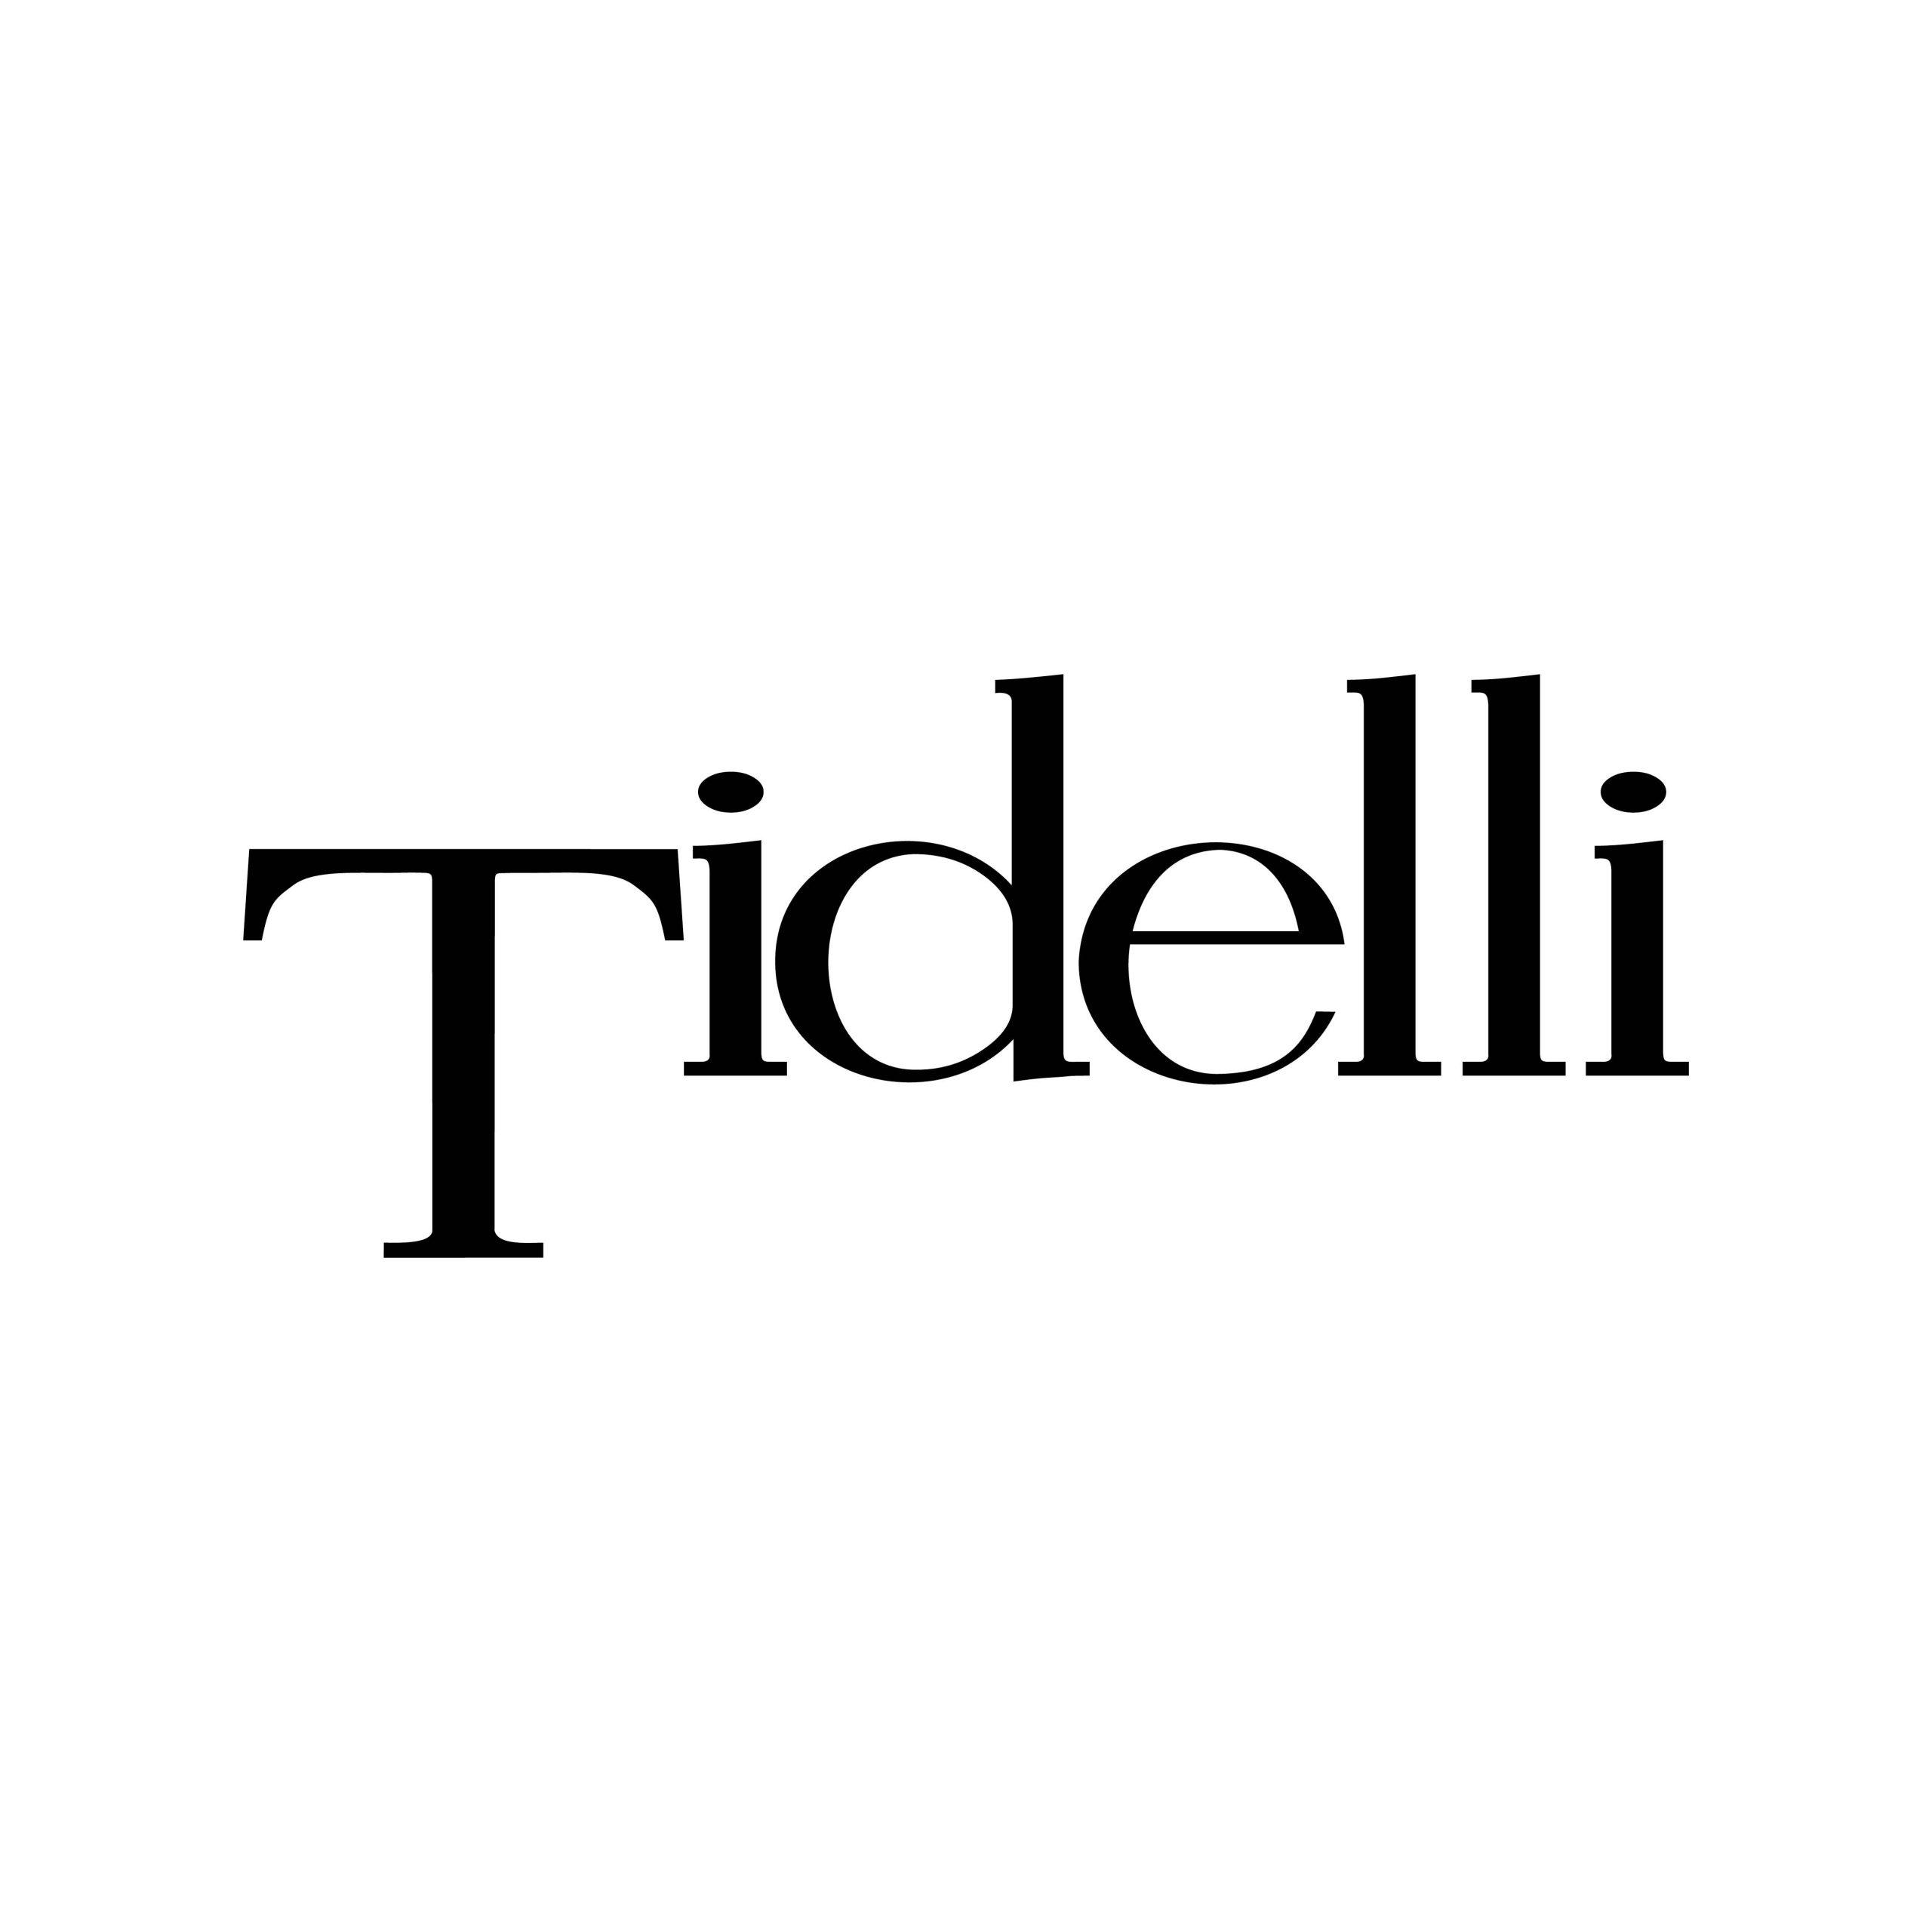 Tidelli